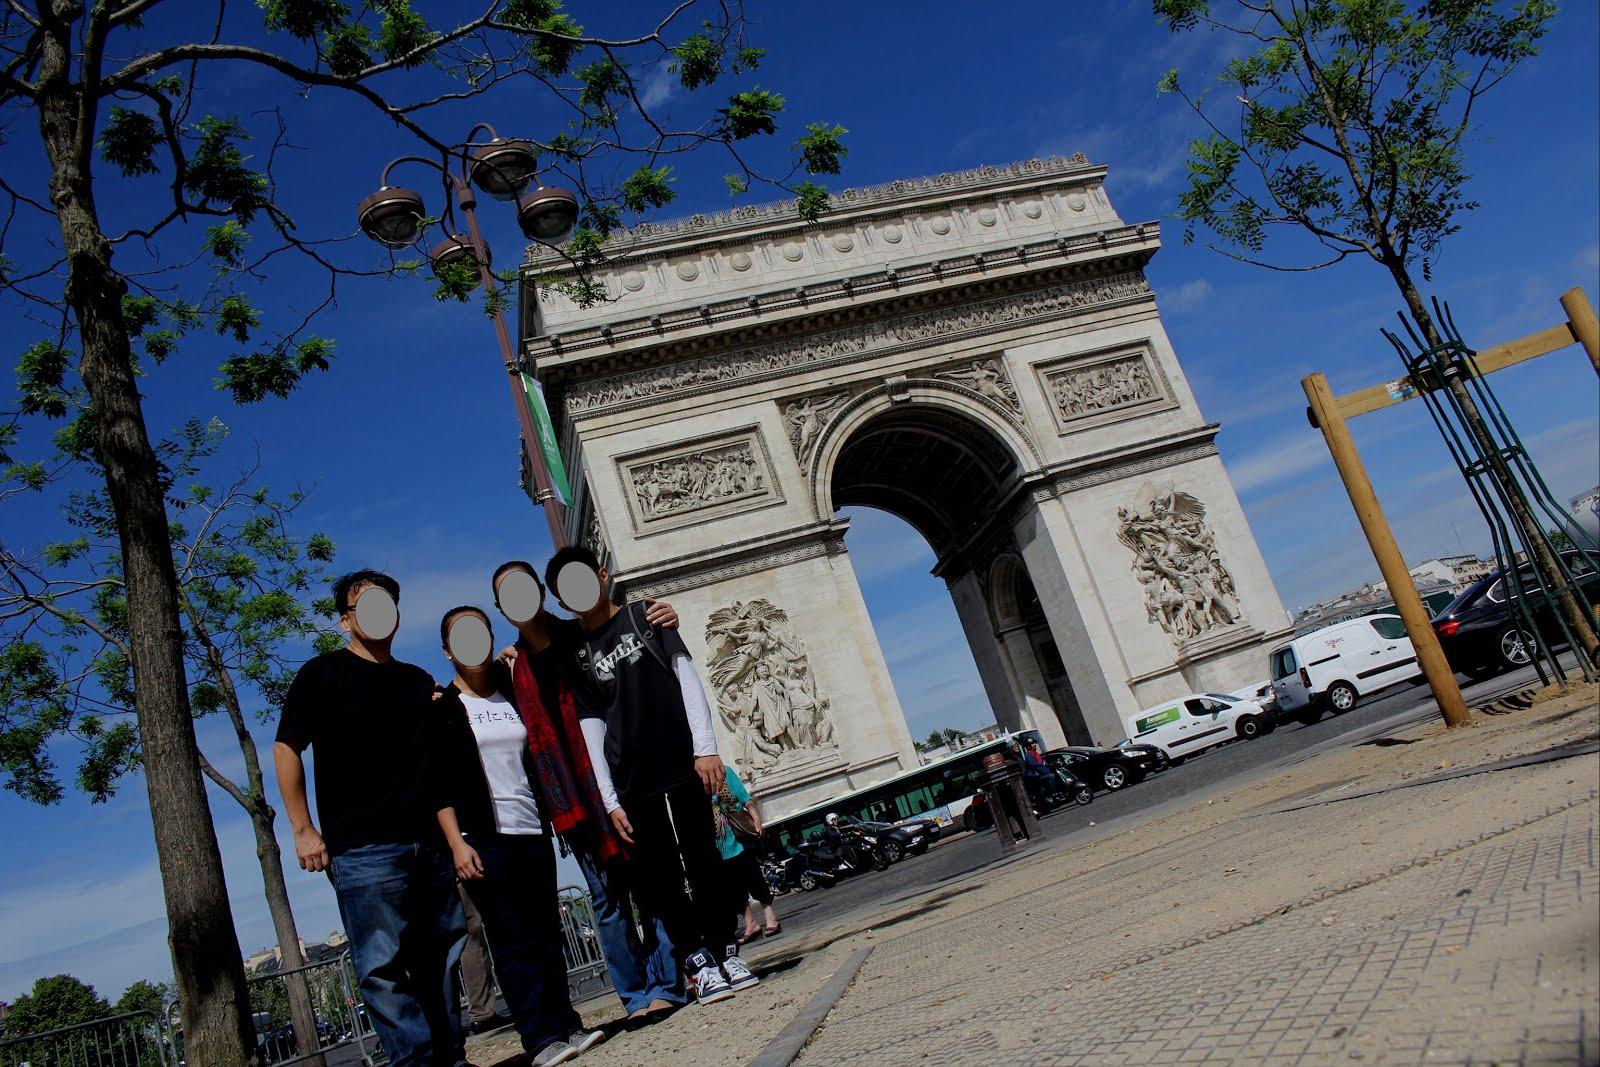 Stay, Stray, Play and Feast: Arc de Triomphe de l'Étoile ...